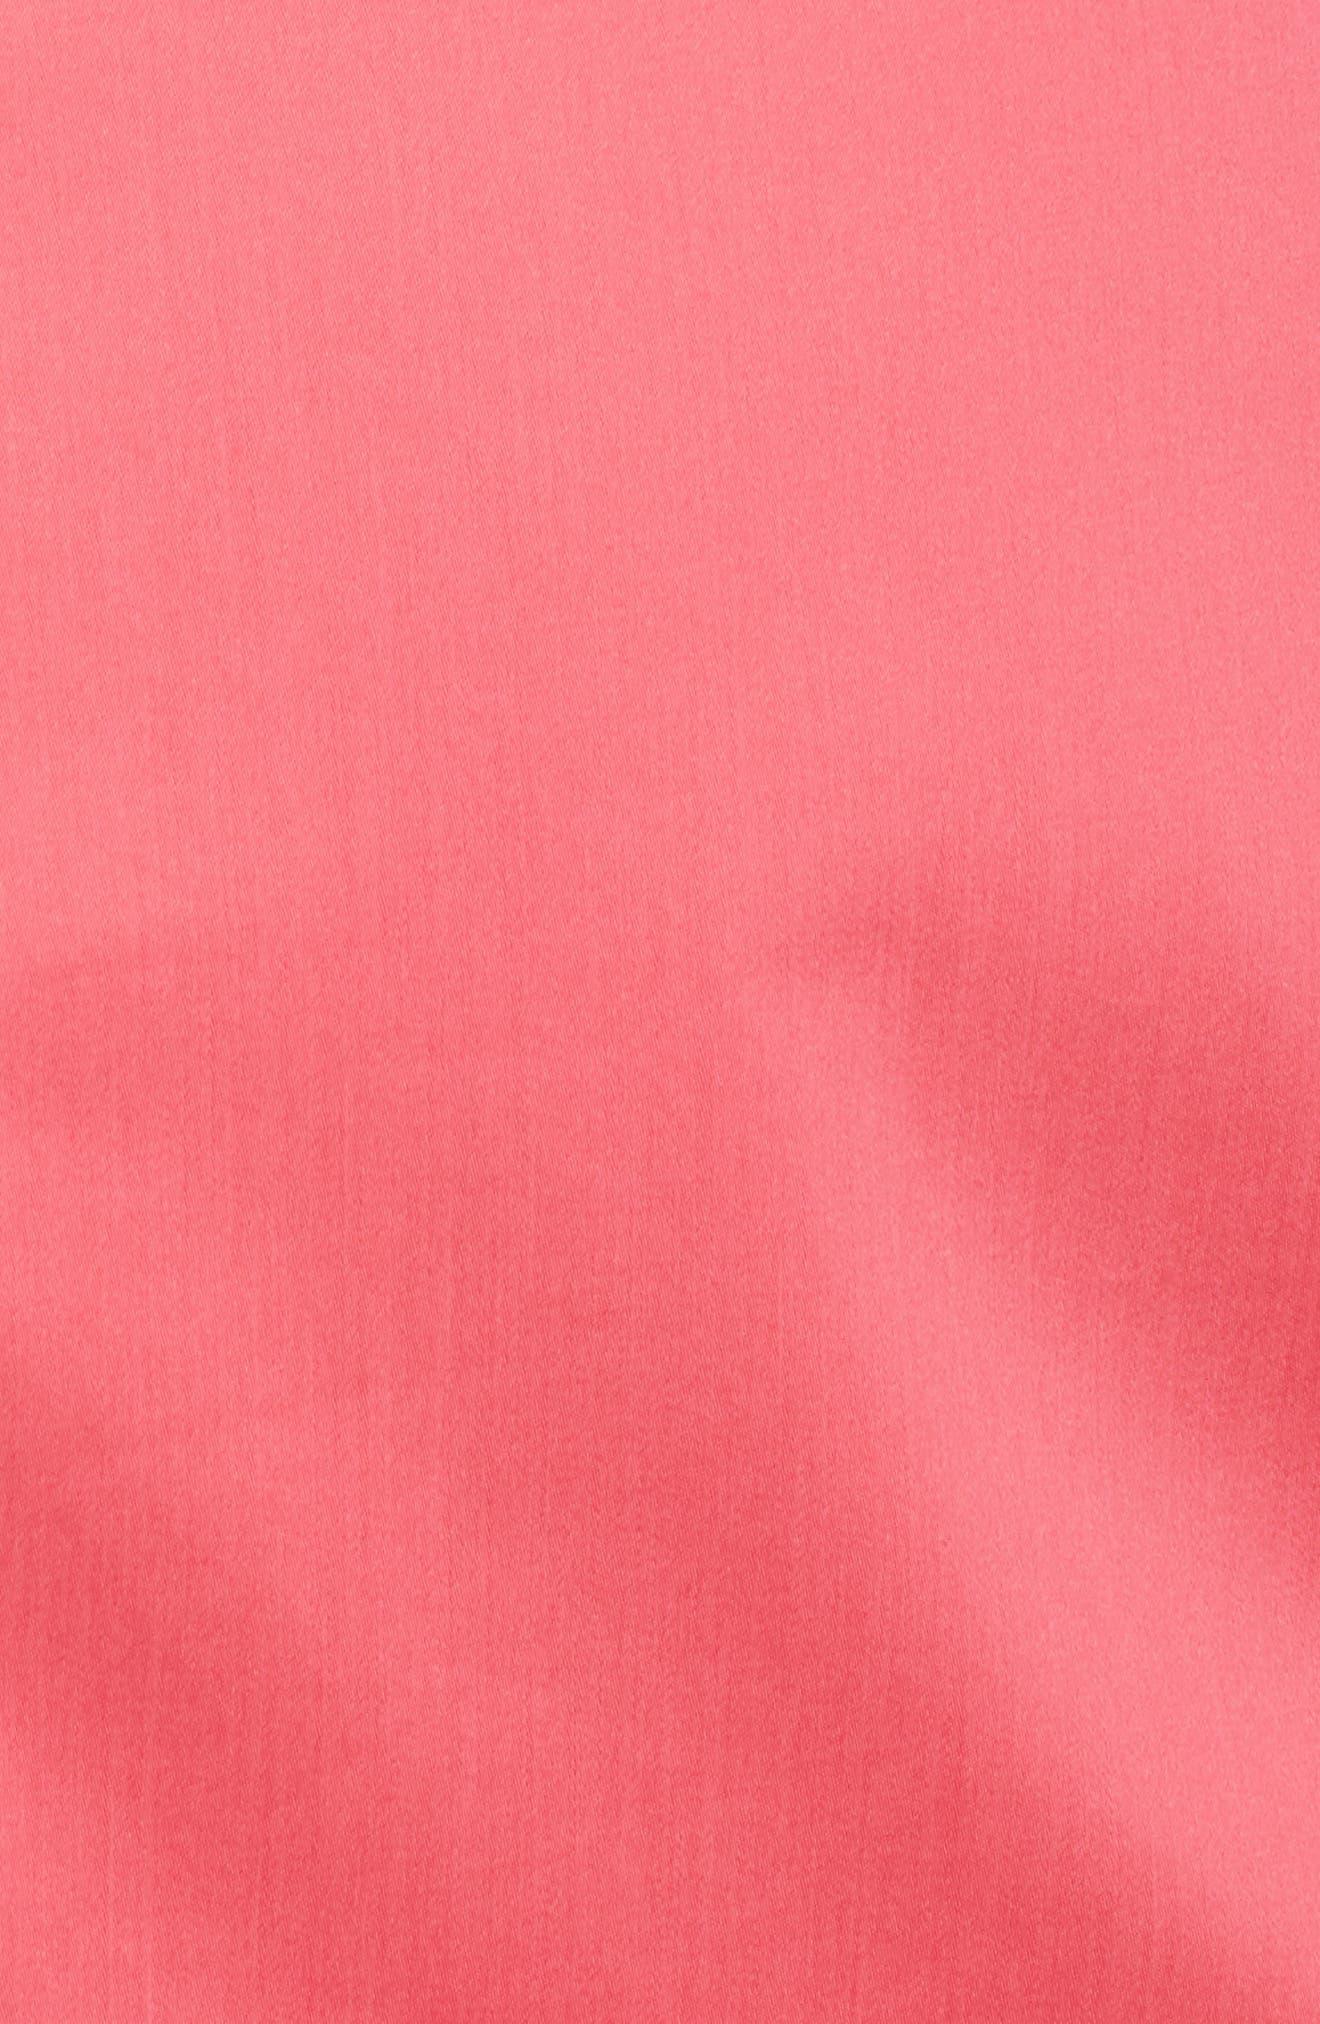 Dasali V-Neck Sheath Dress,                             Alternate thumbnail 6, color,                             Lychee Pink